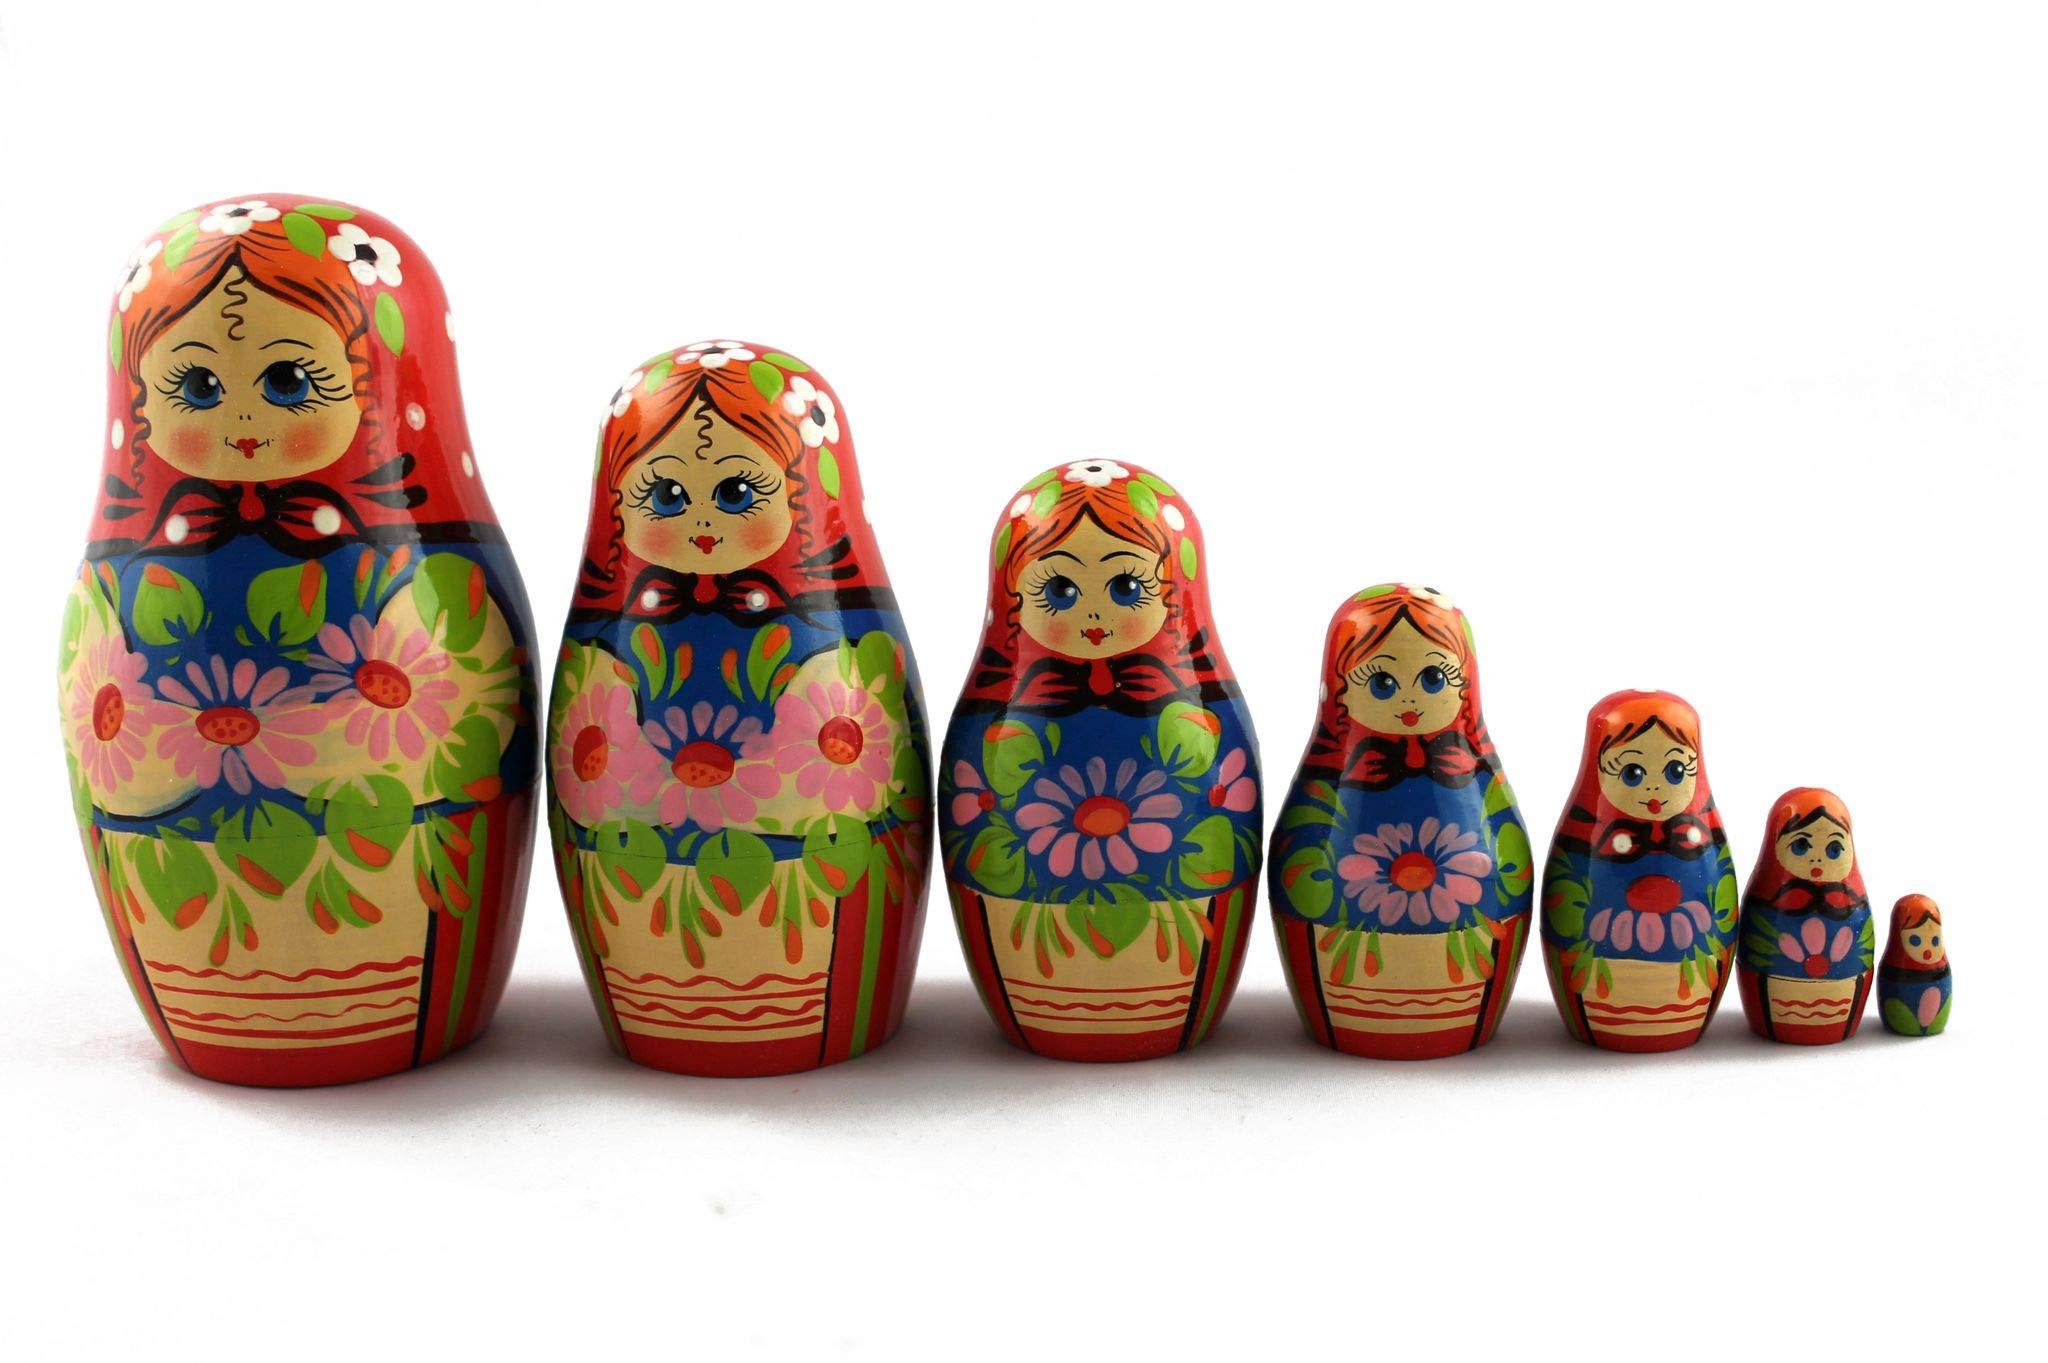 Russian Nesting Dolls - Classic Russian Ornament and Beautiful Chrysanthemum - Set 7 pcs